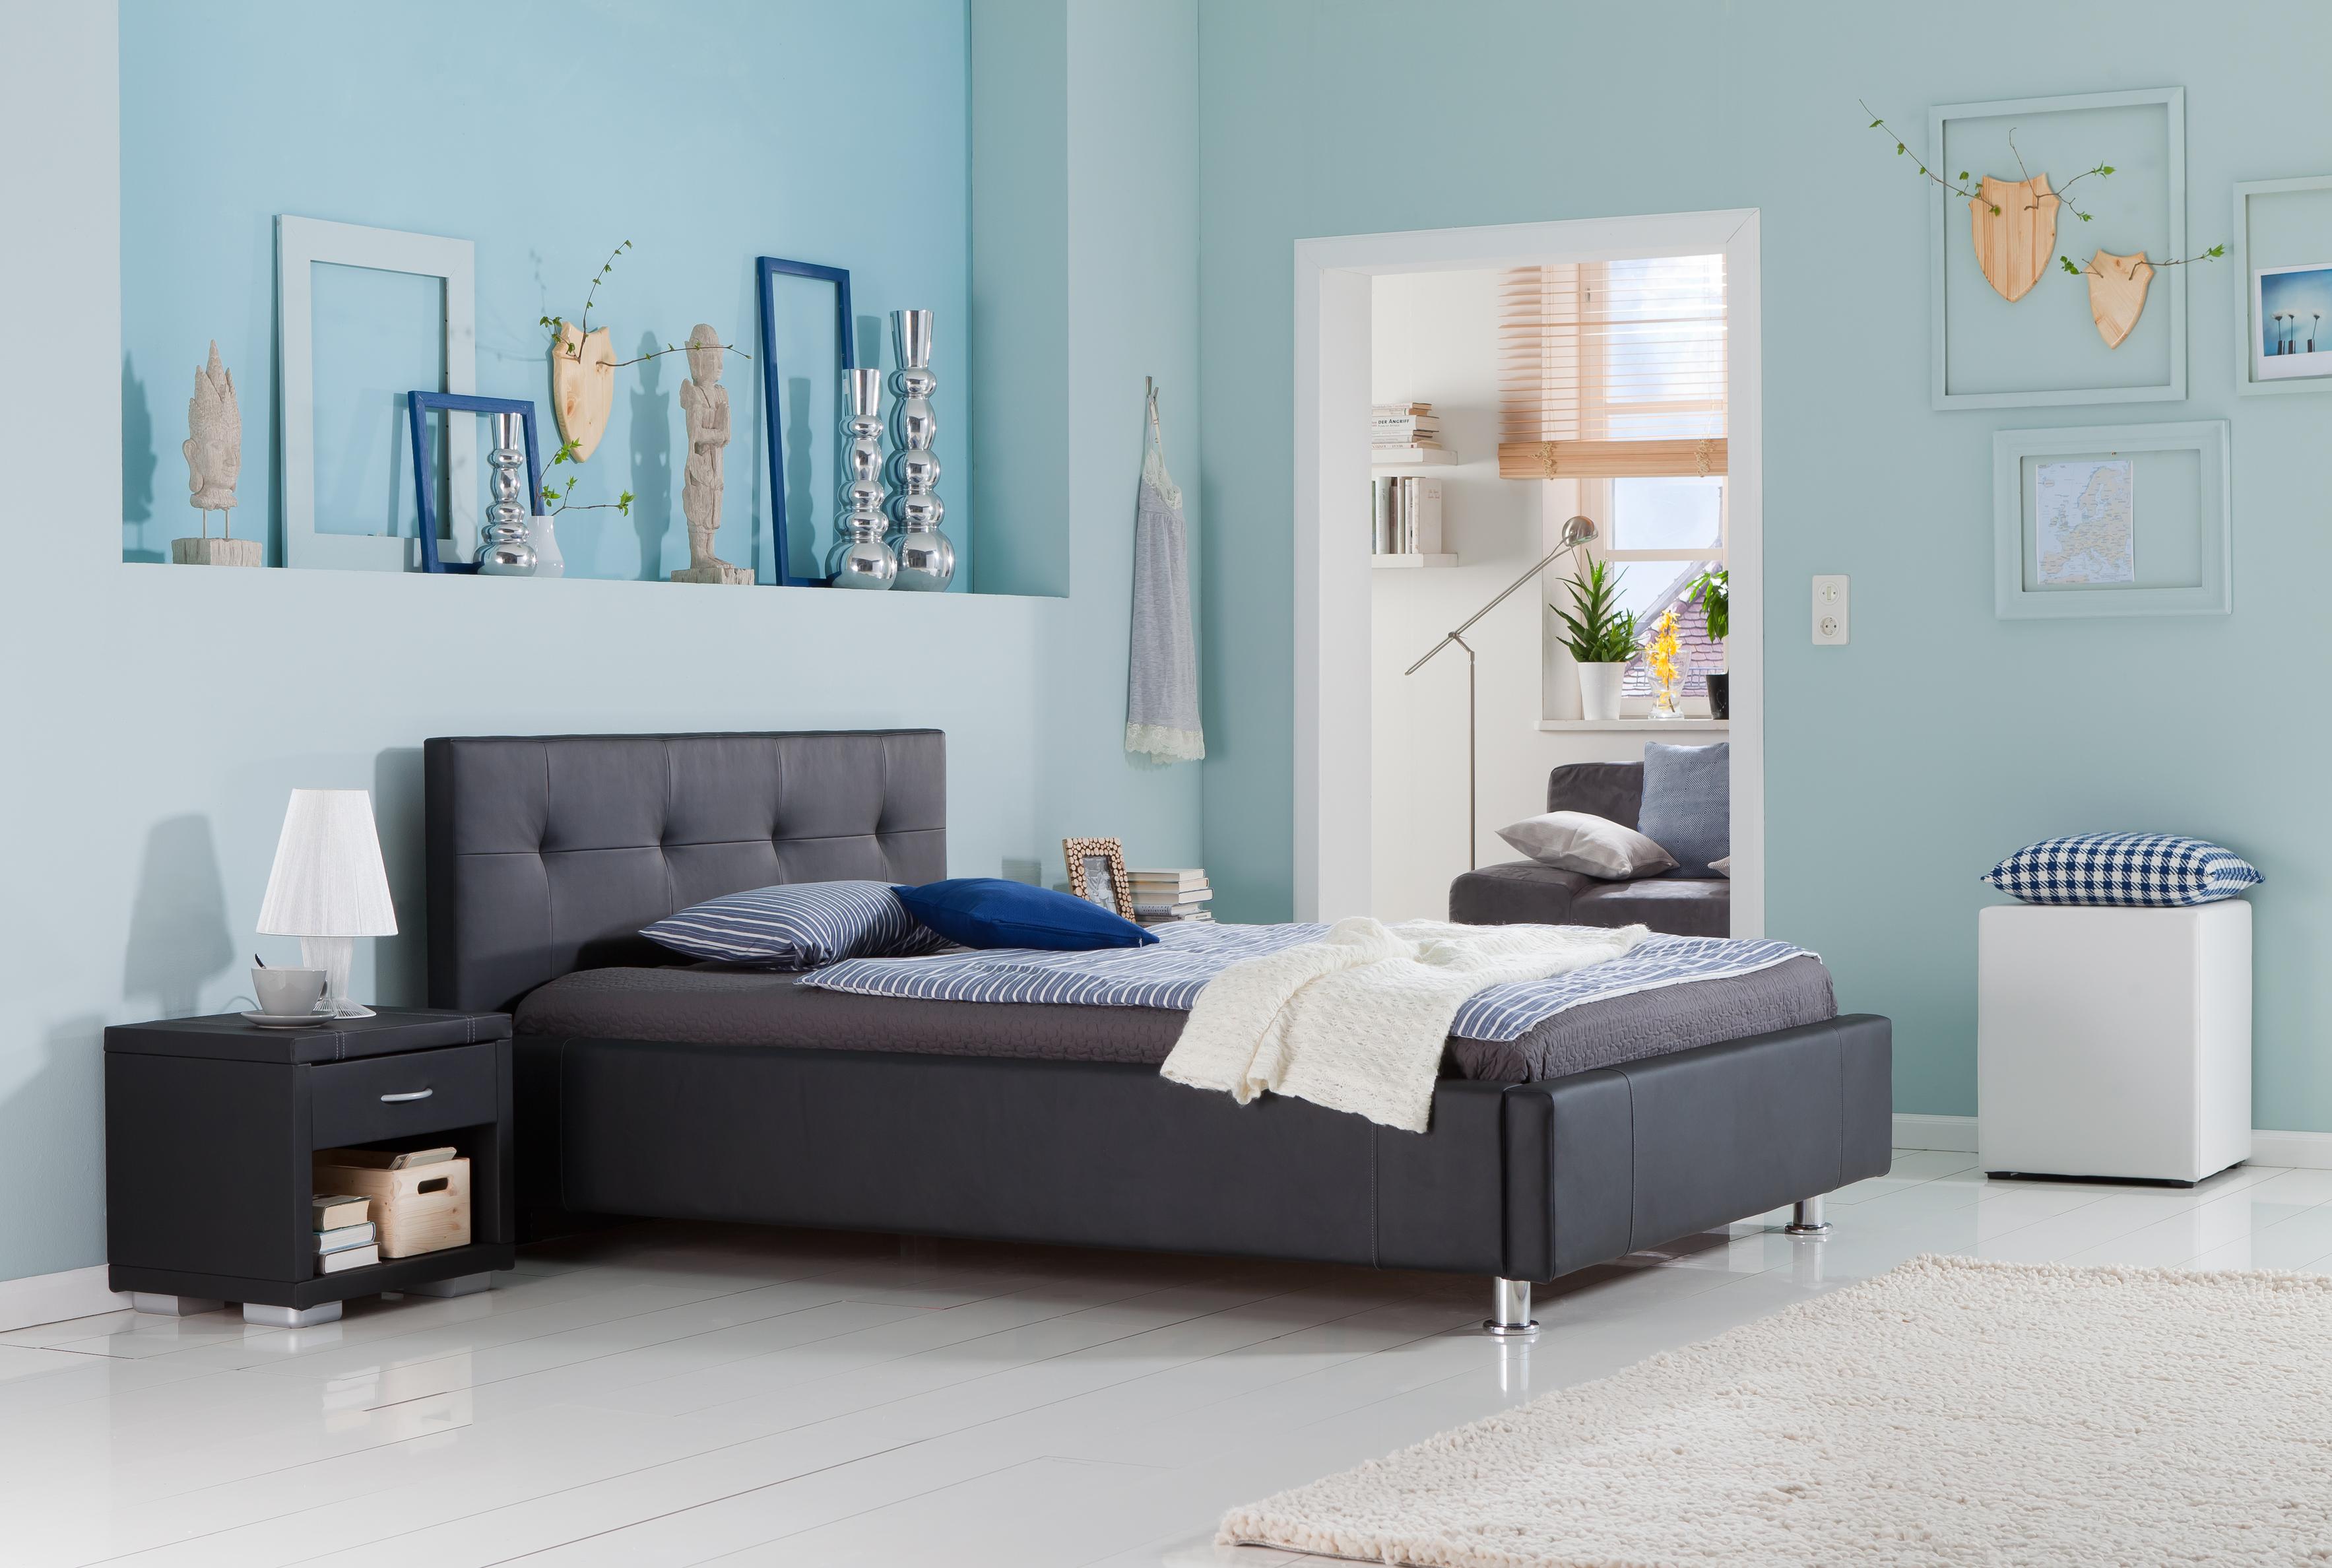 kunstlederbett mareike osterburg matratzen. Black Bedroom Furniture Sets. Home Design Ideas